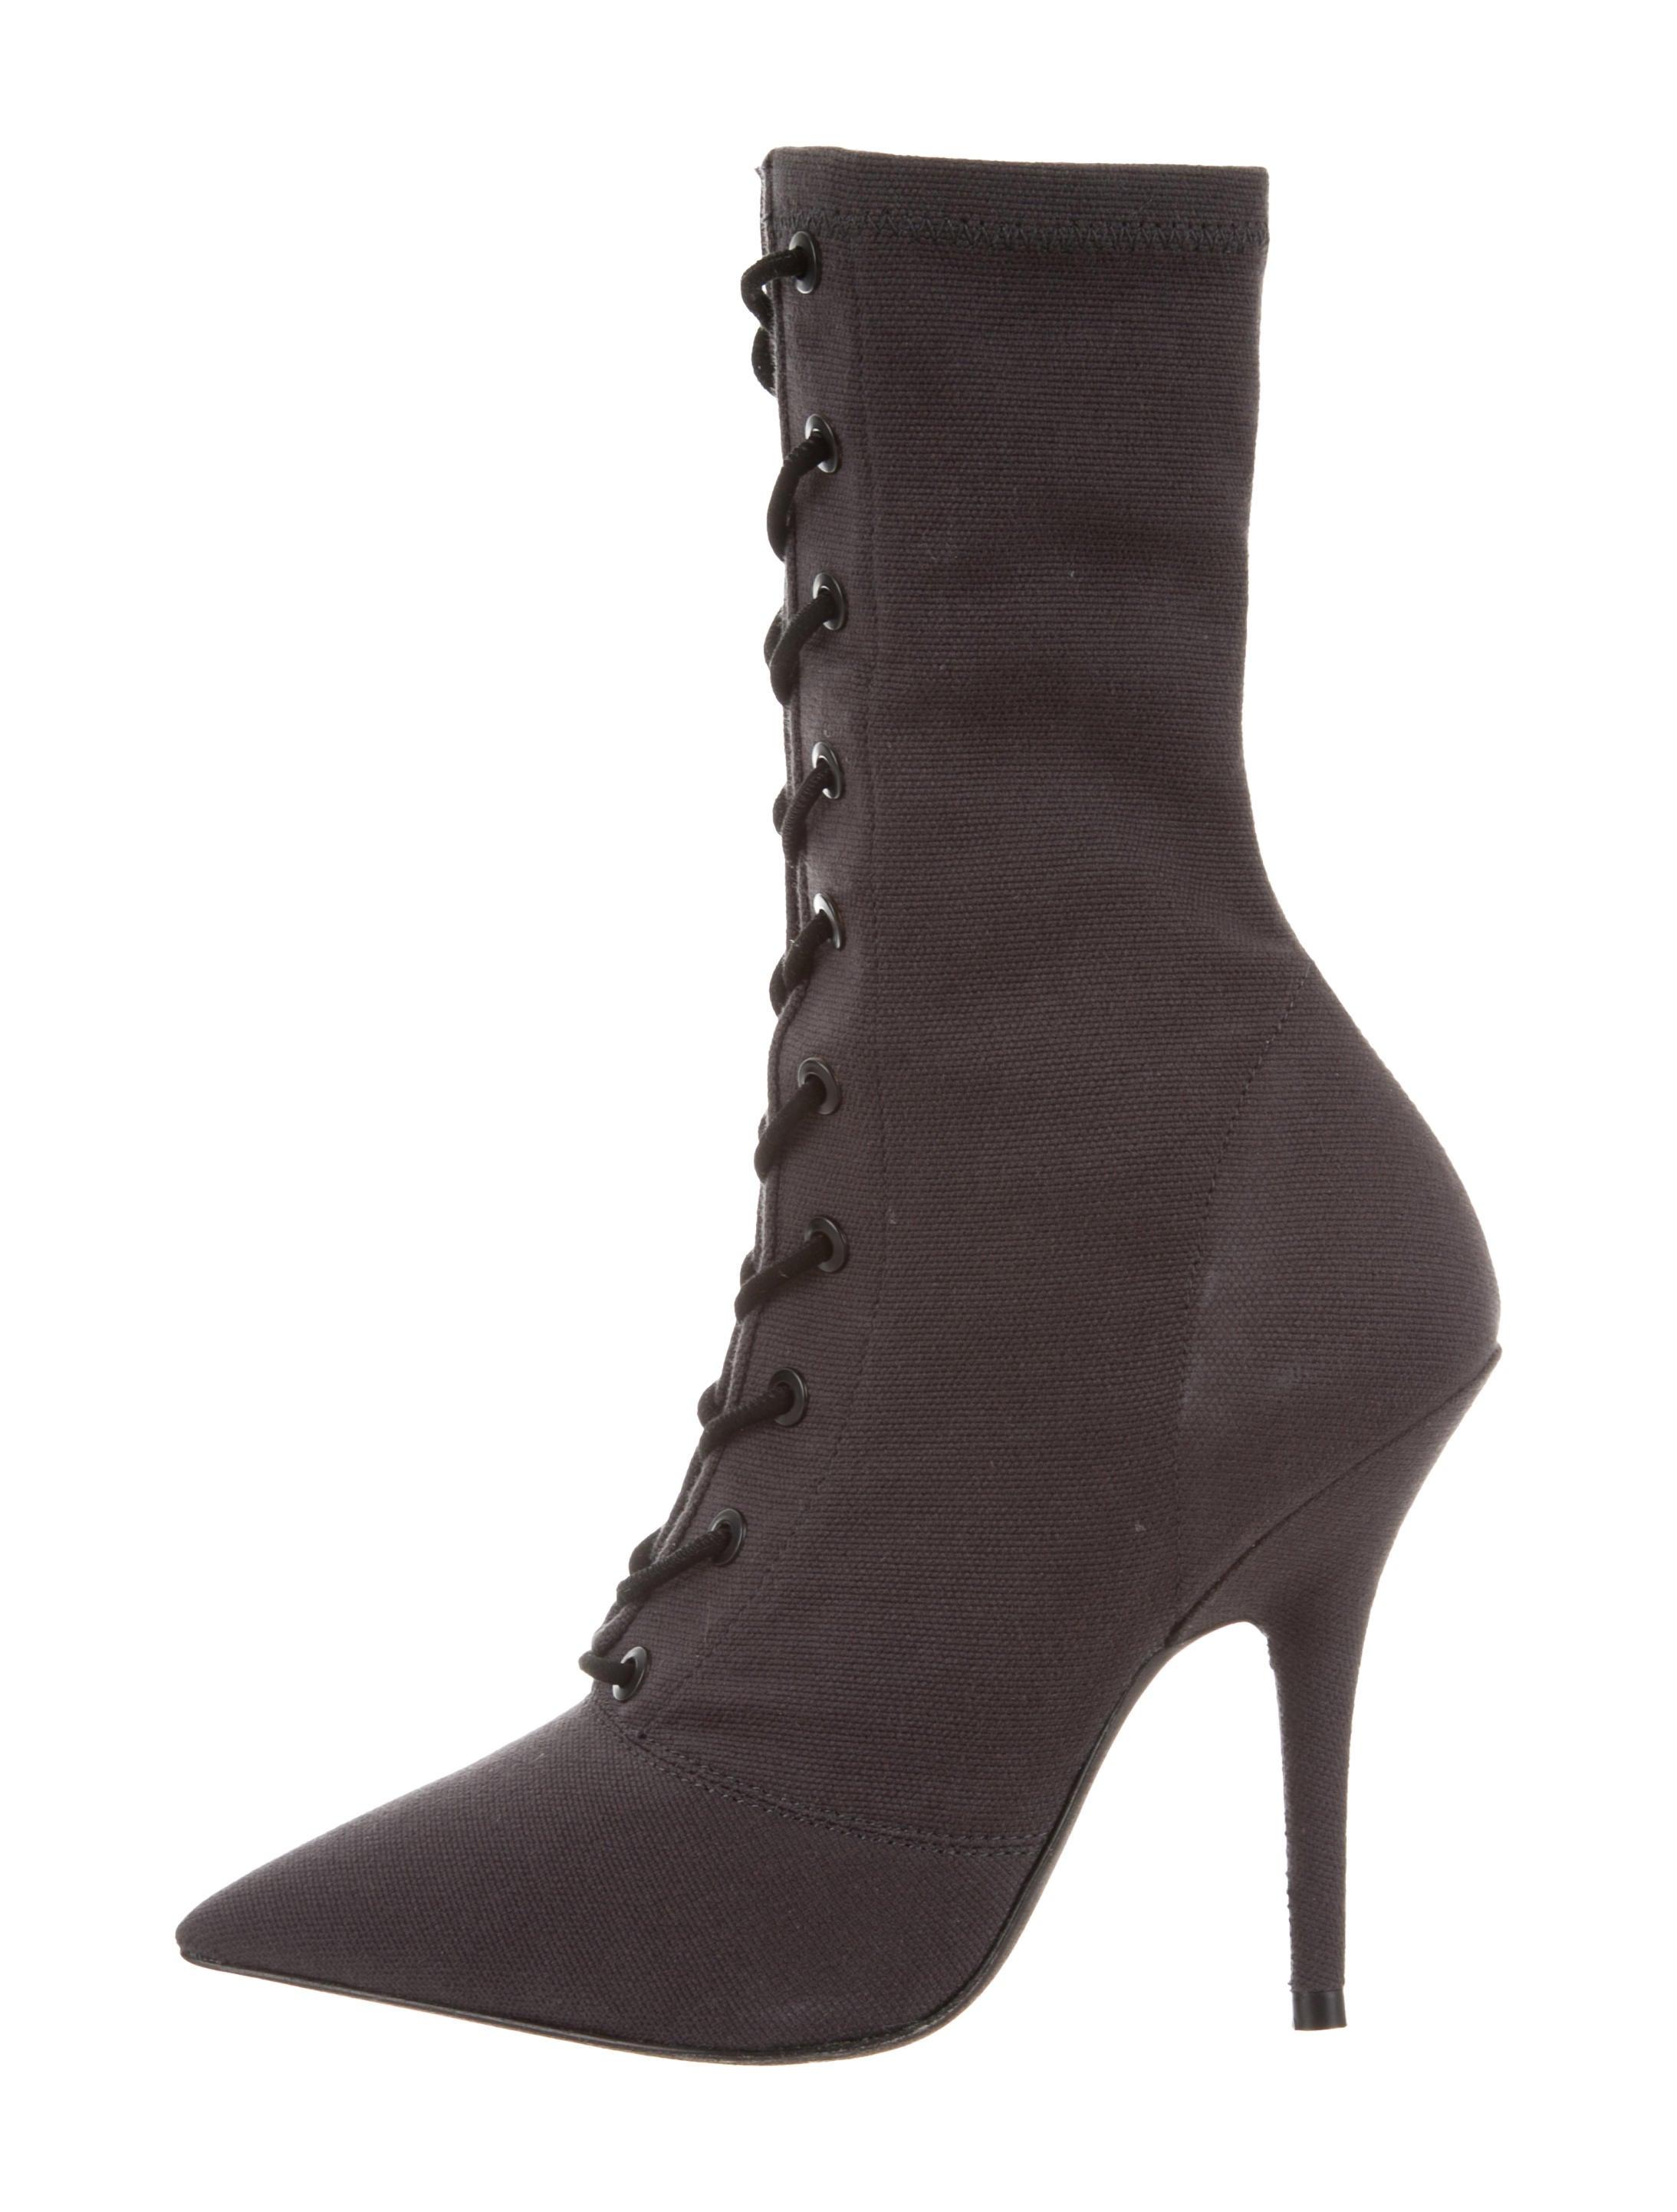 2ccffbd8b812 Yeezy Season 6 Ankle Boots w  Tags - Shoes - WYEEZ20920